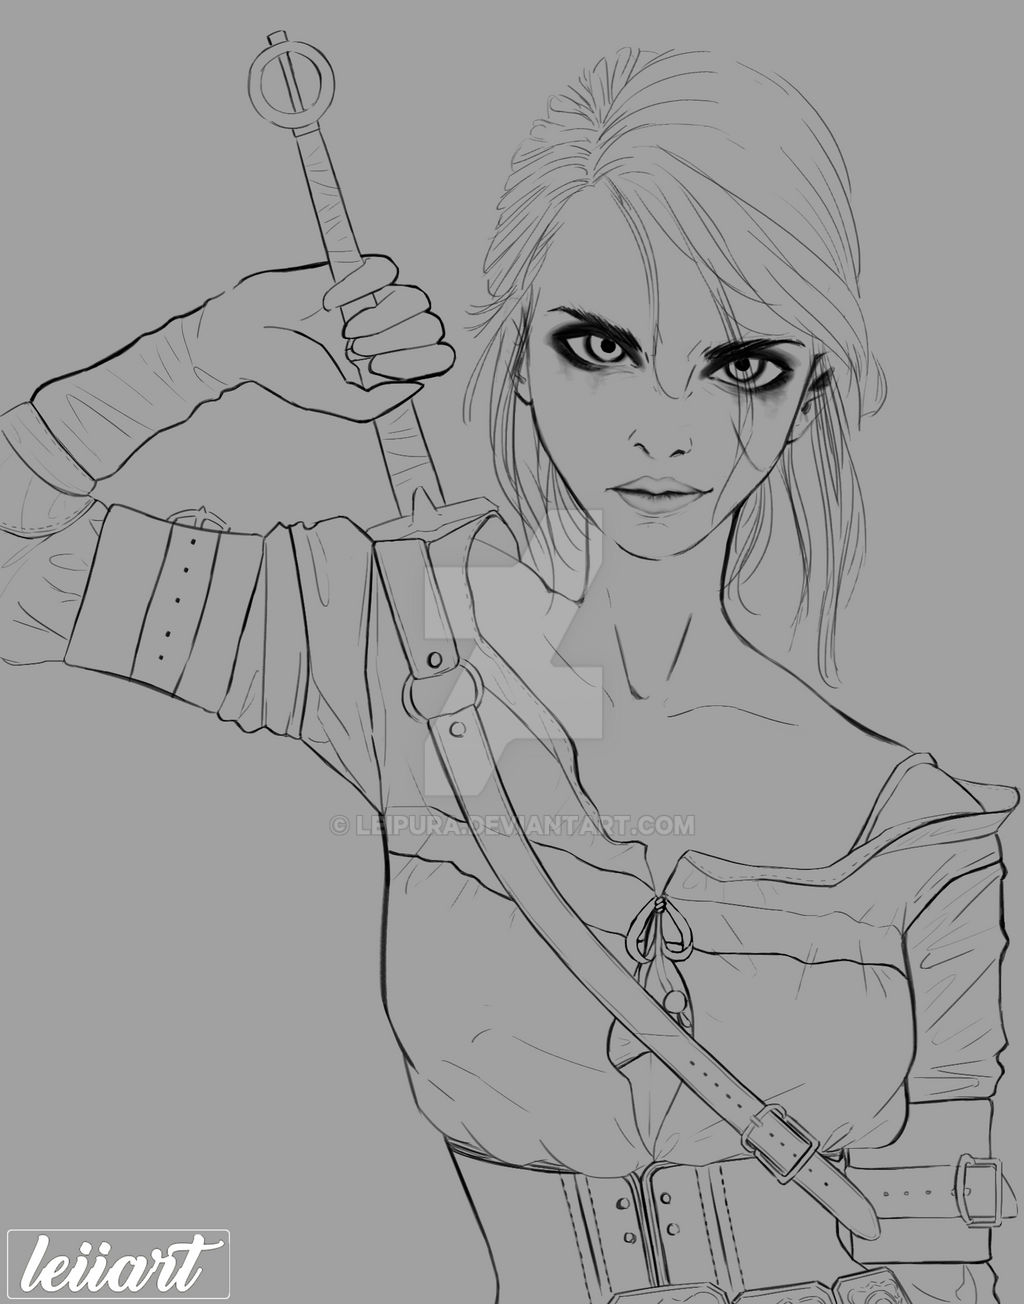 01 Ciri-sketch